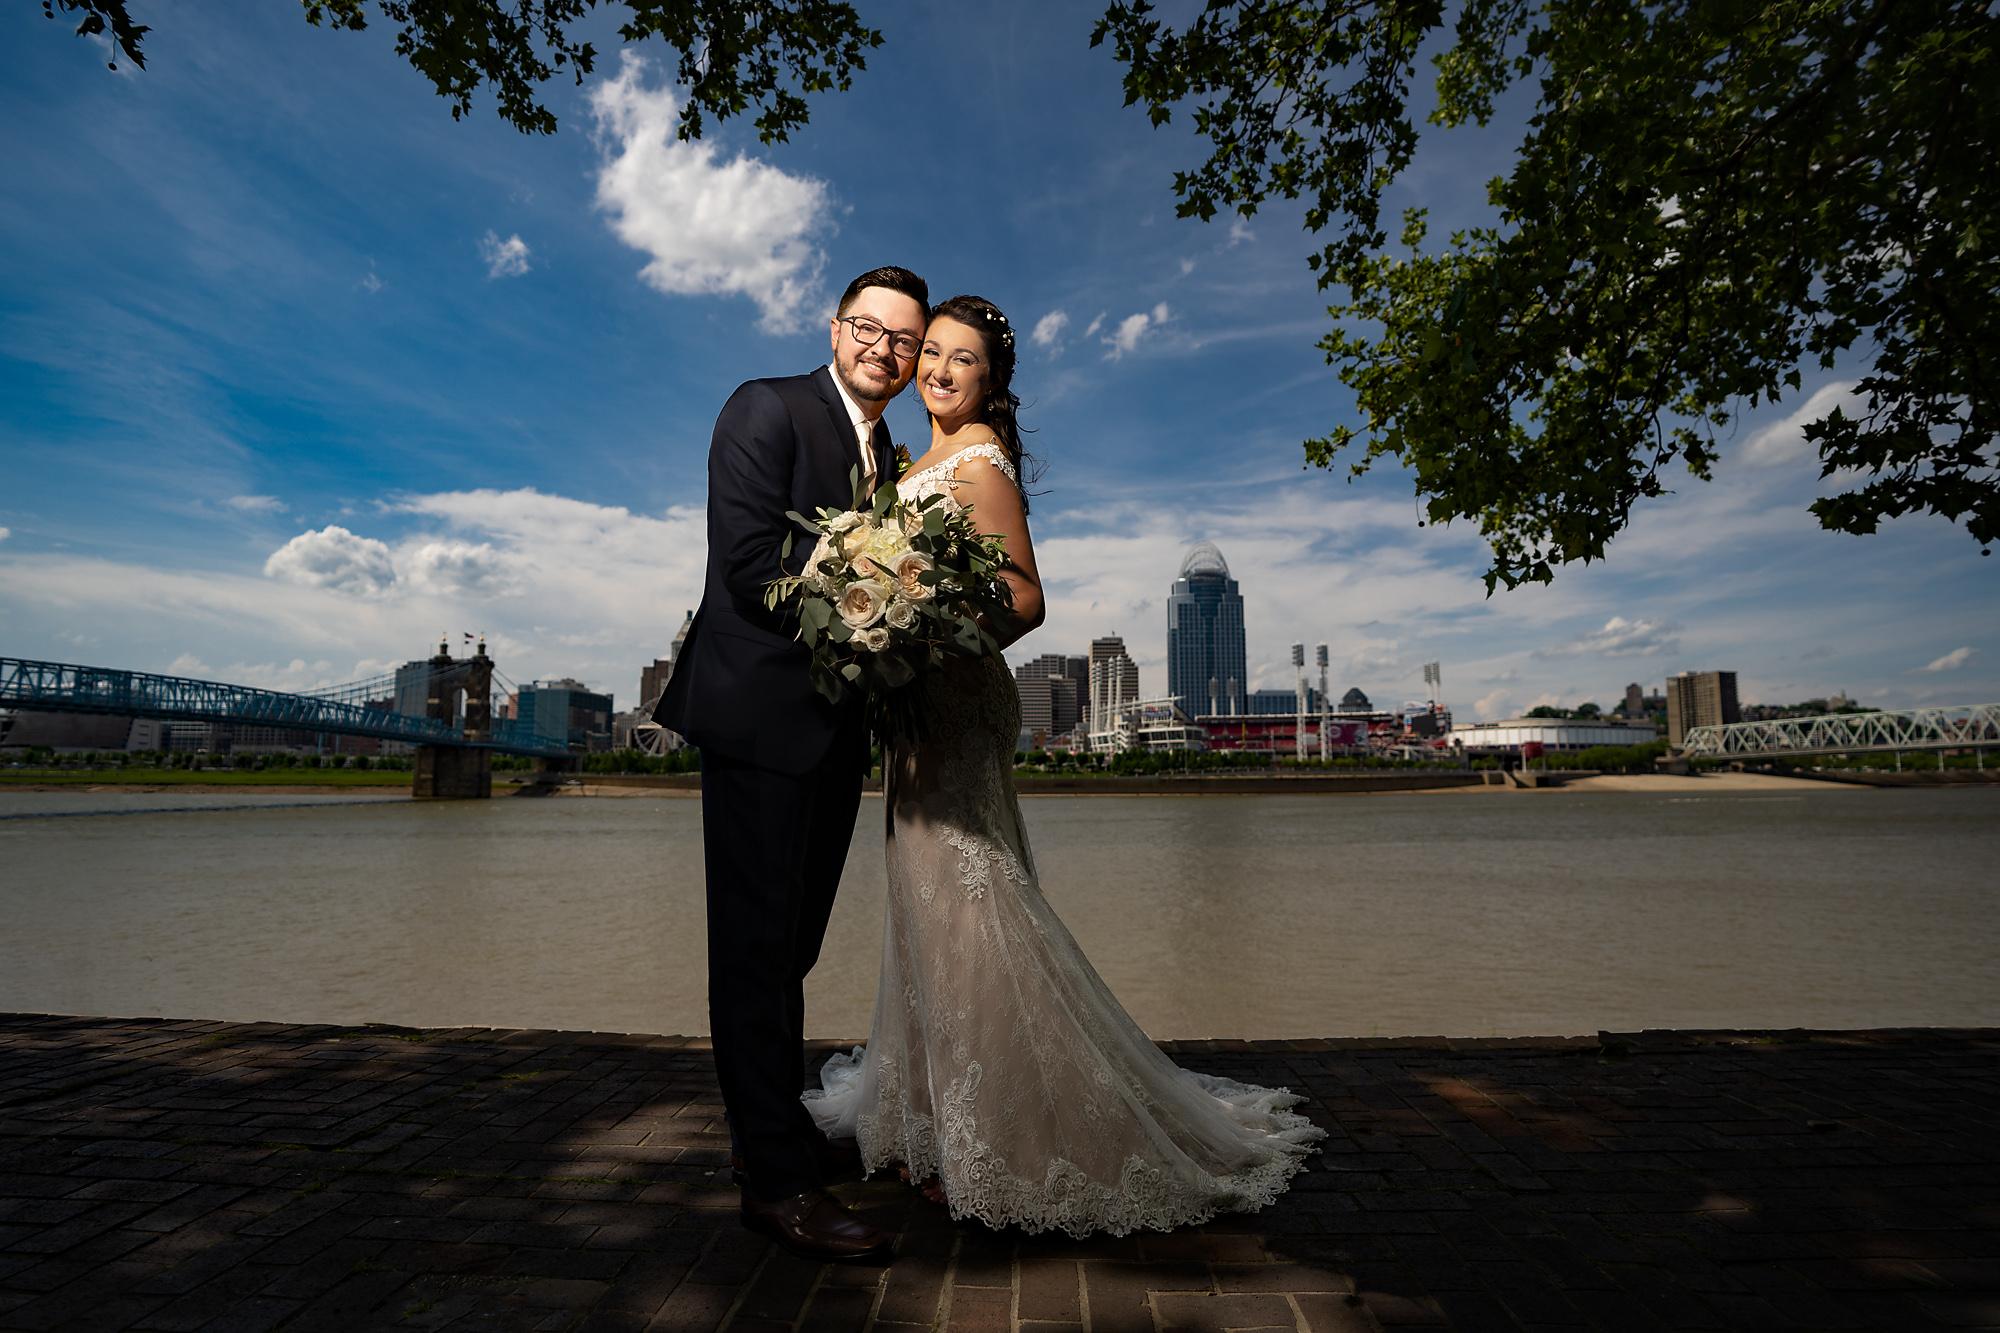 Embassy-Suites-Rivercenter-Wedding-Photography-12.jpg